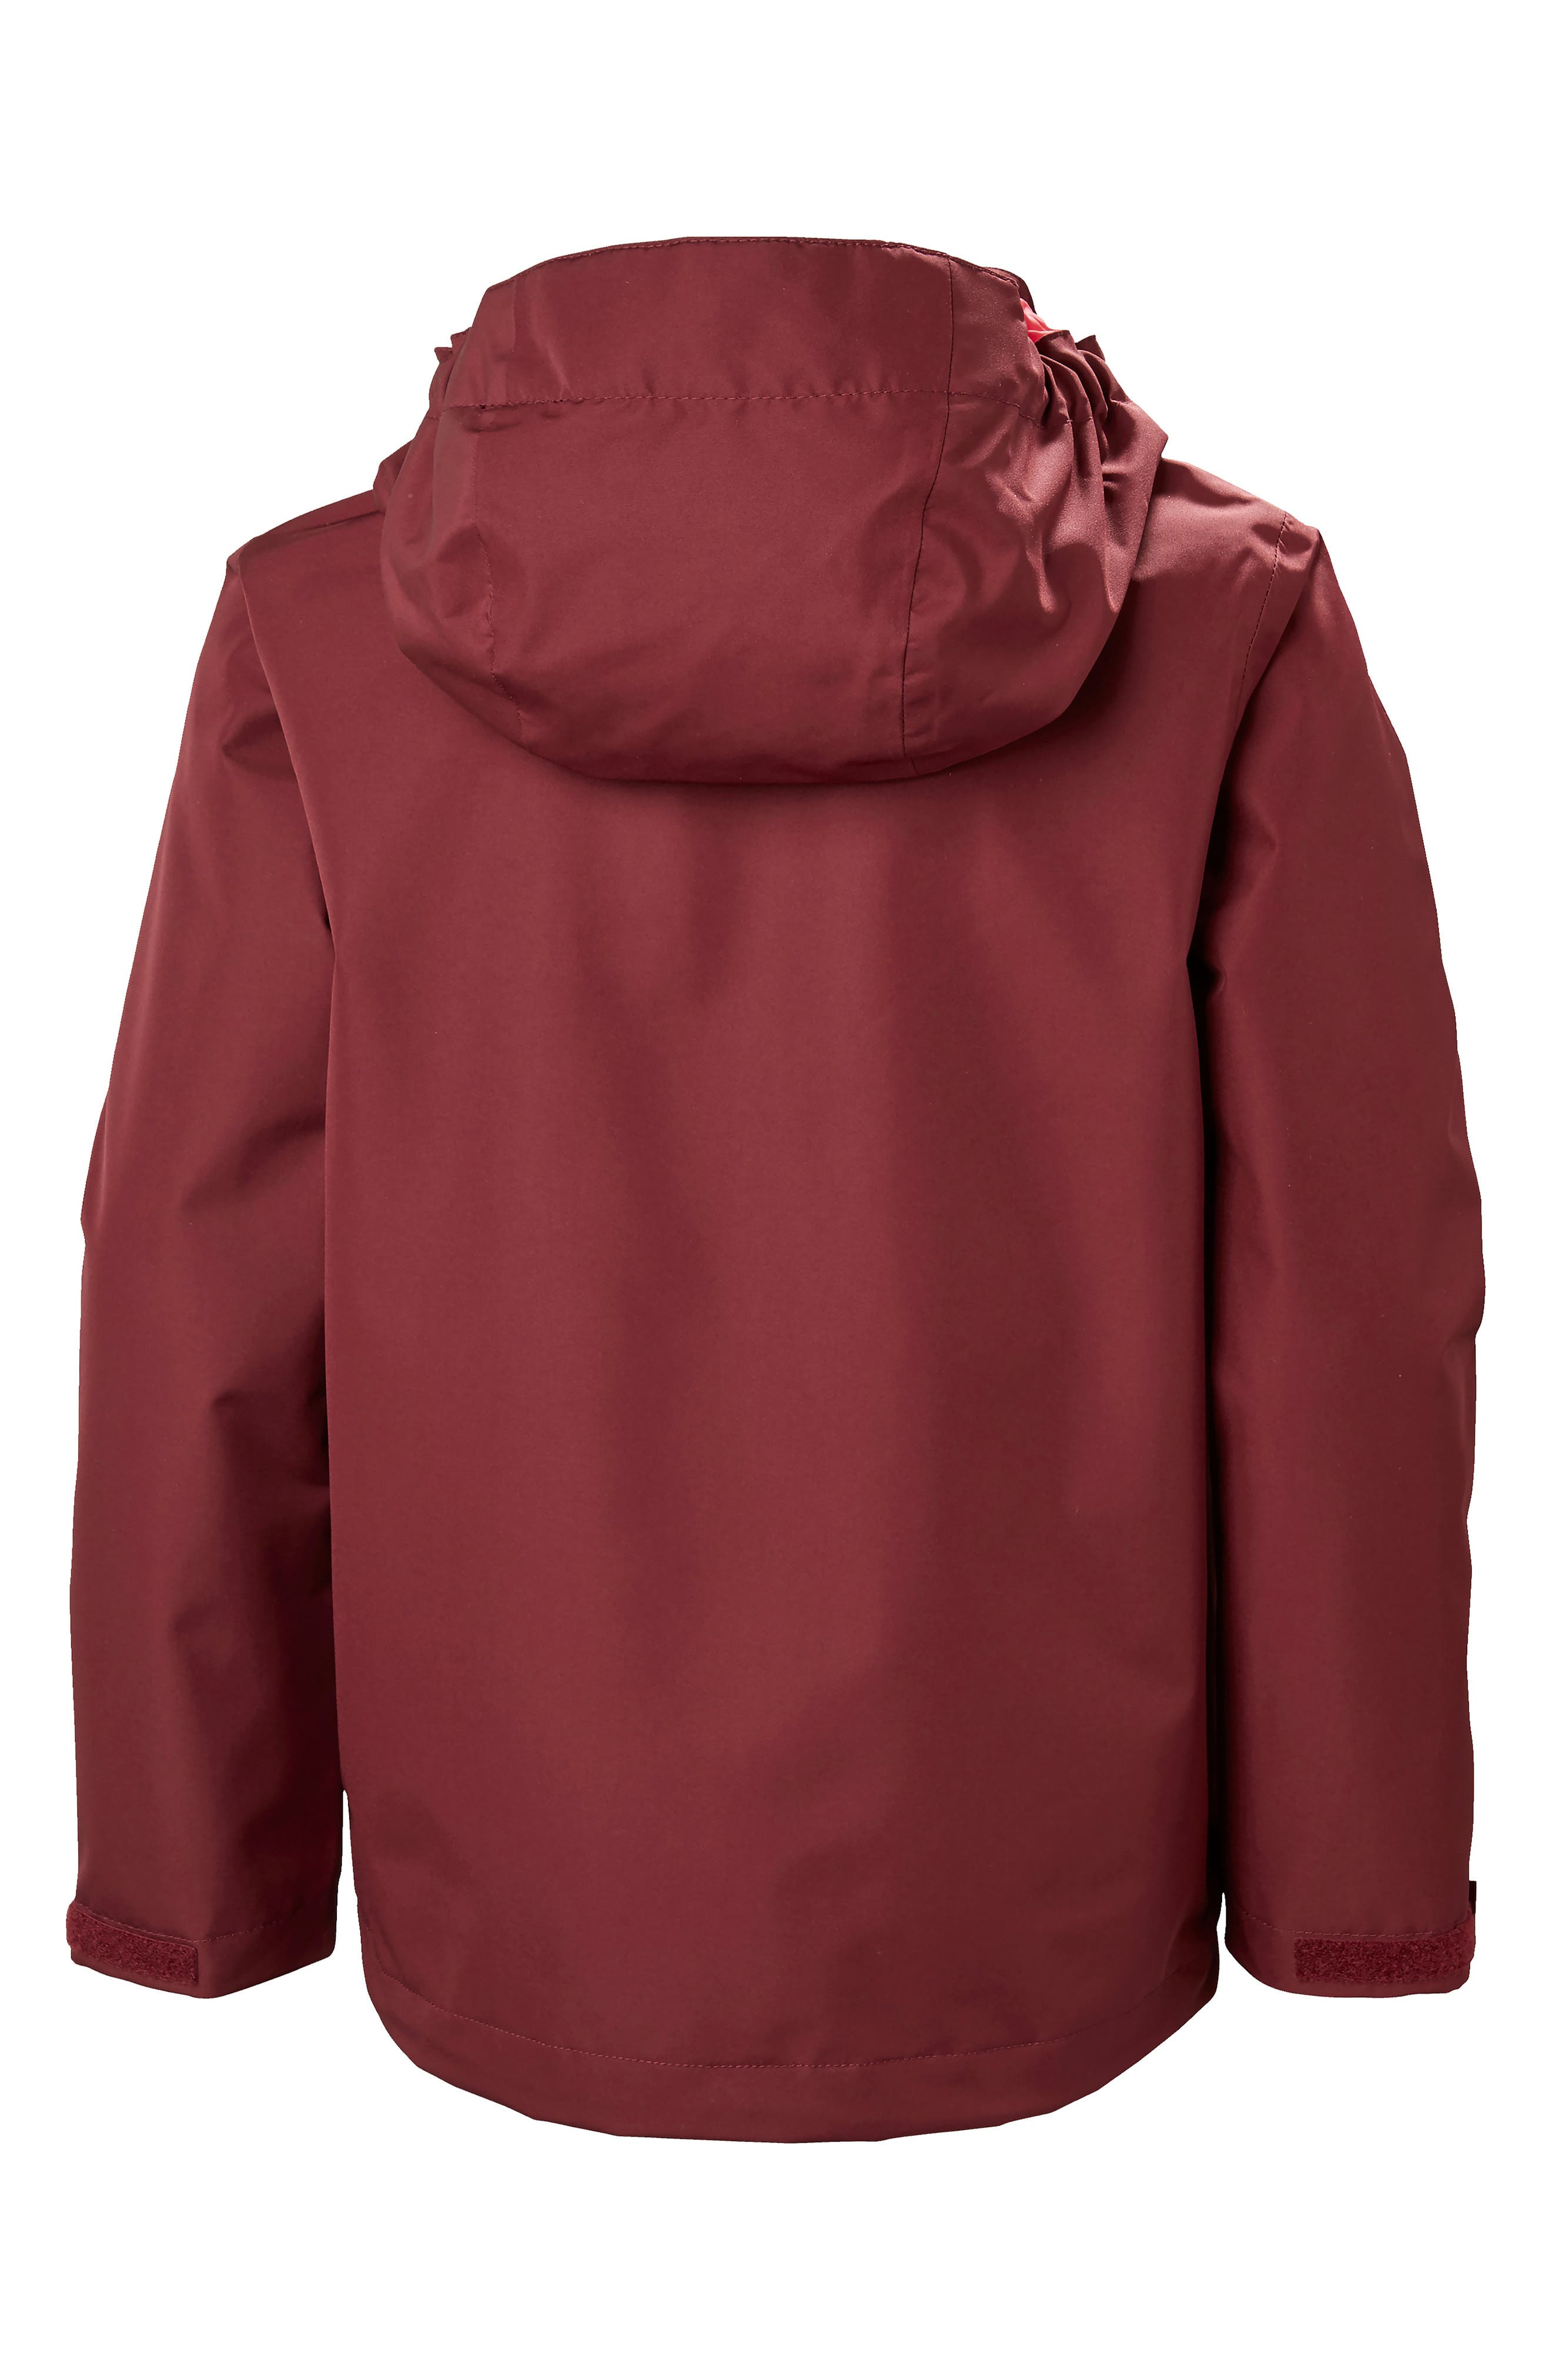 Seven Hooded Jacket,                             Alternate thumbnail 2, color,                             Cabernet